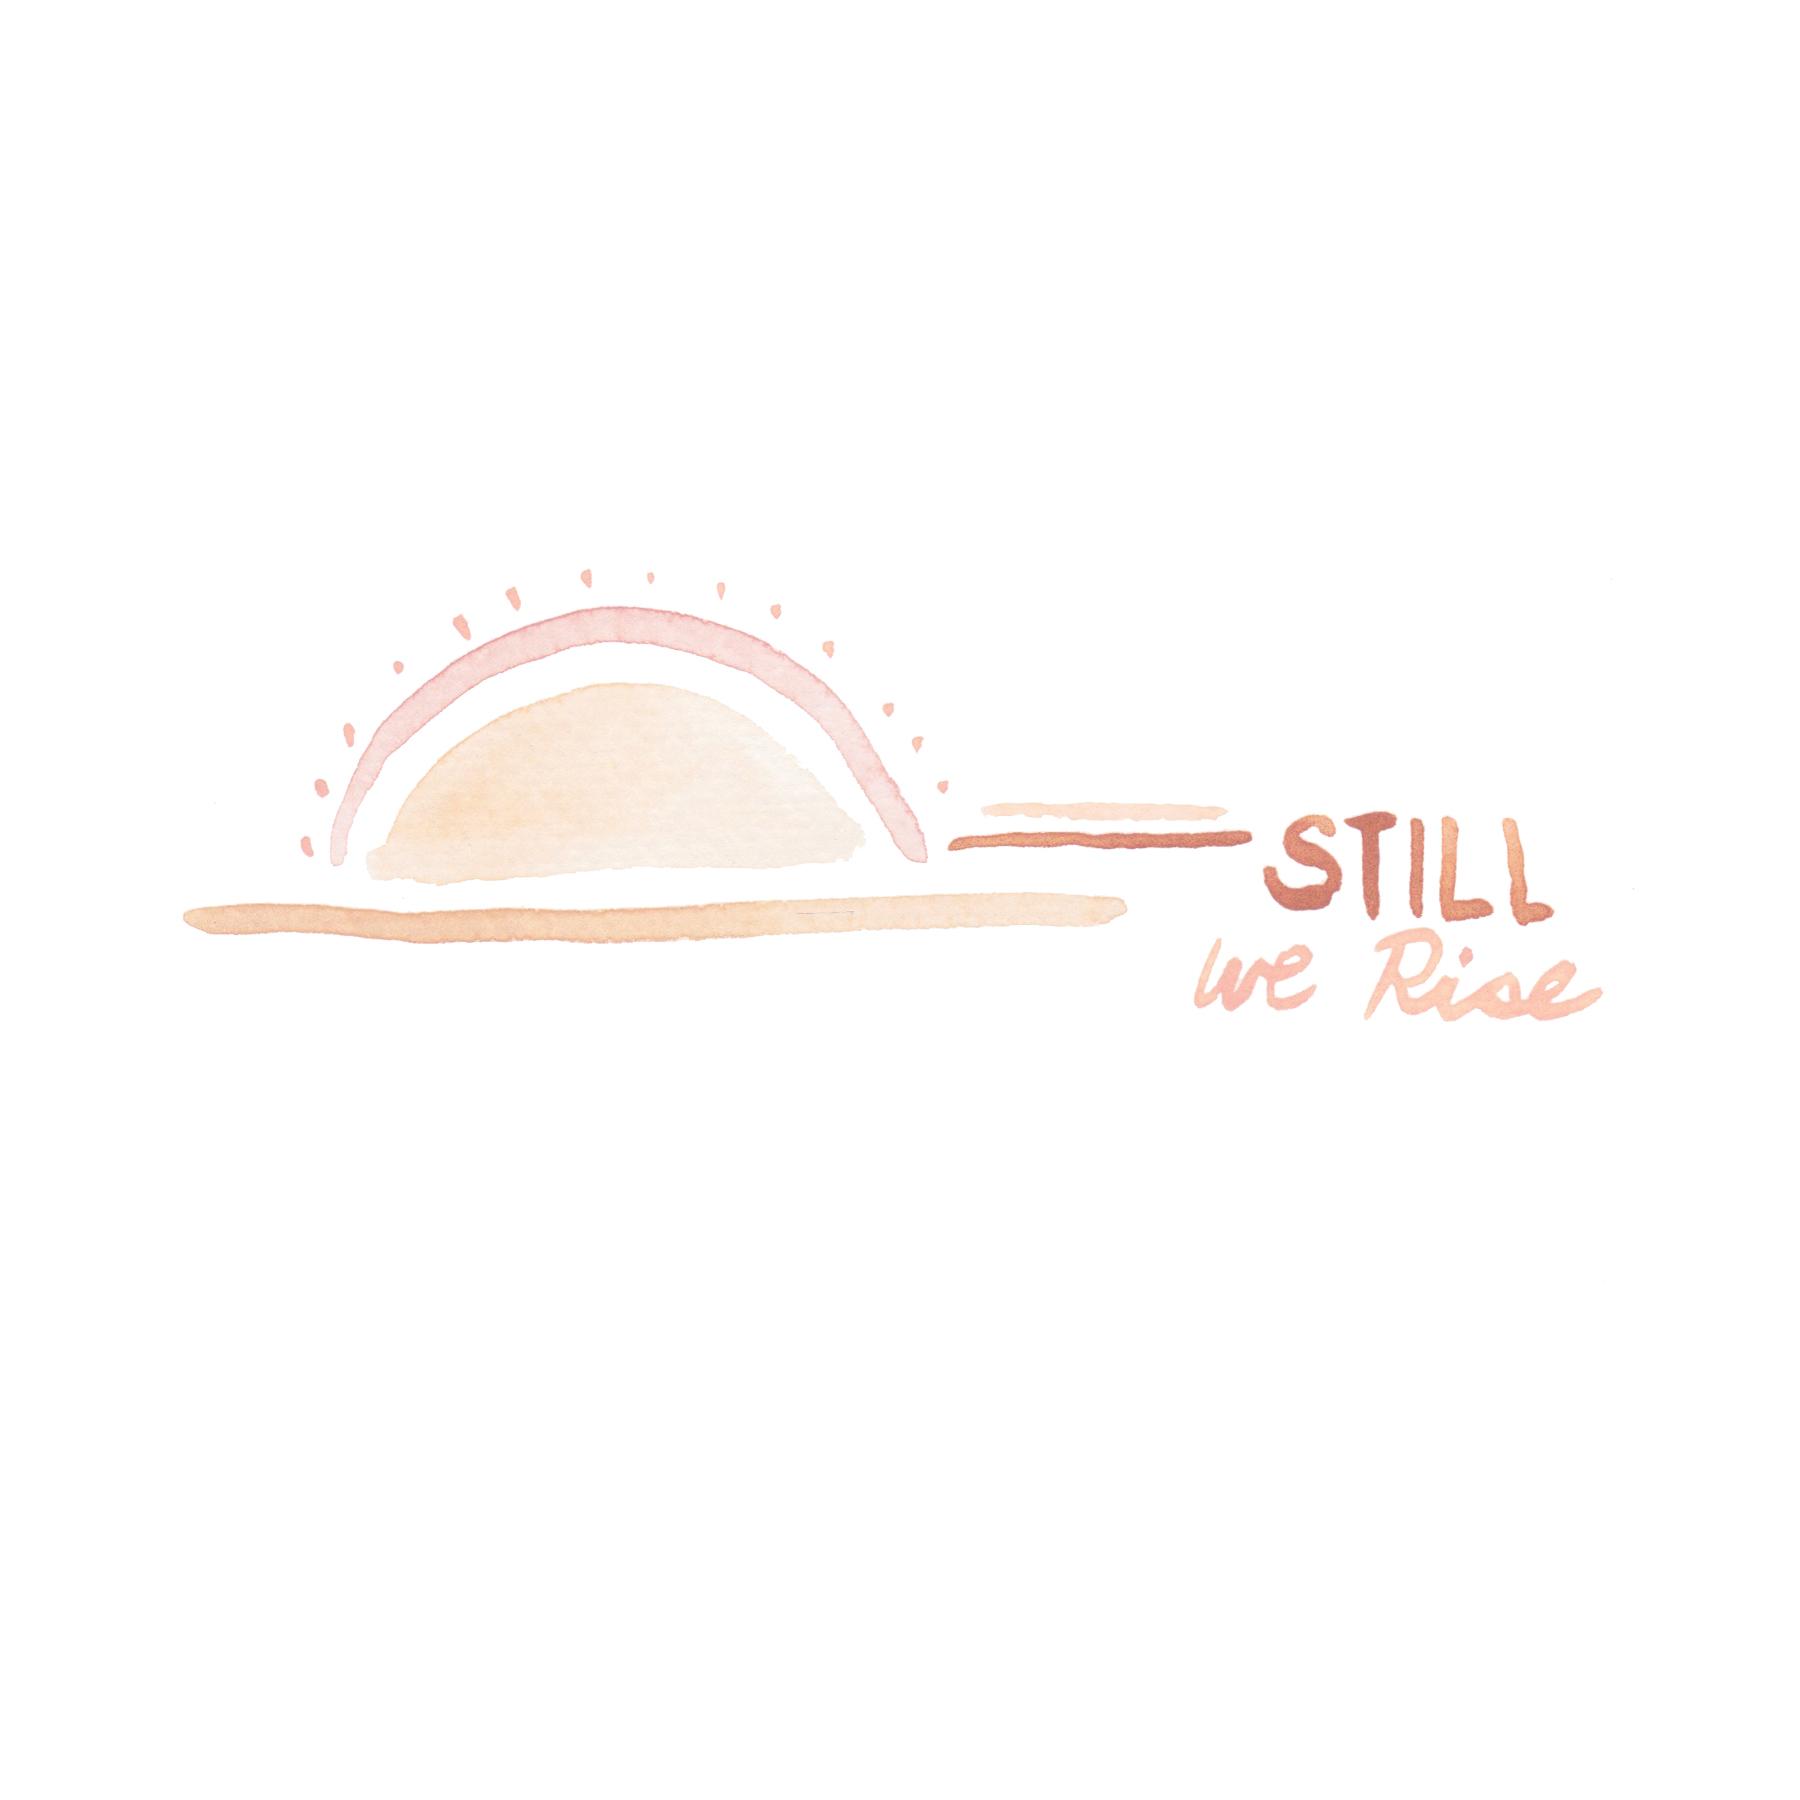 still we rise #2 by joya logue